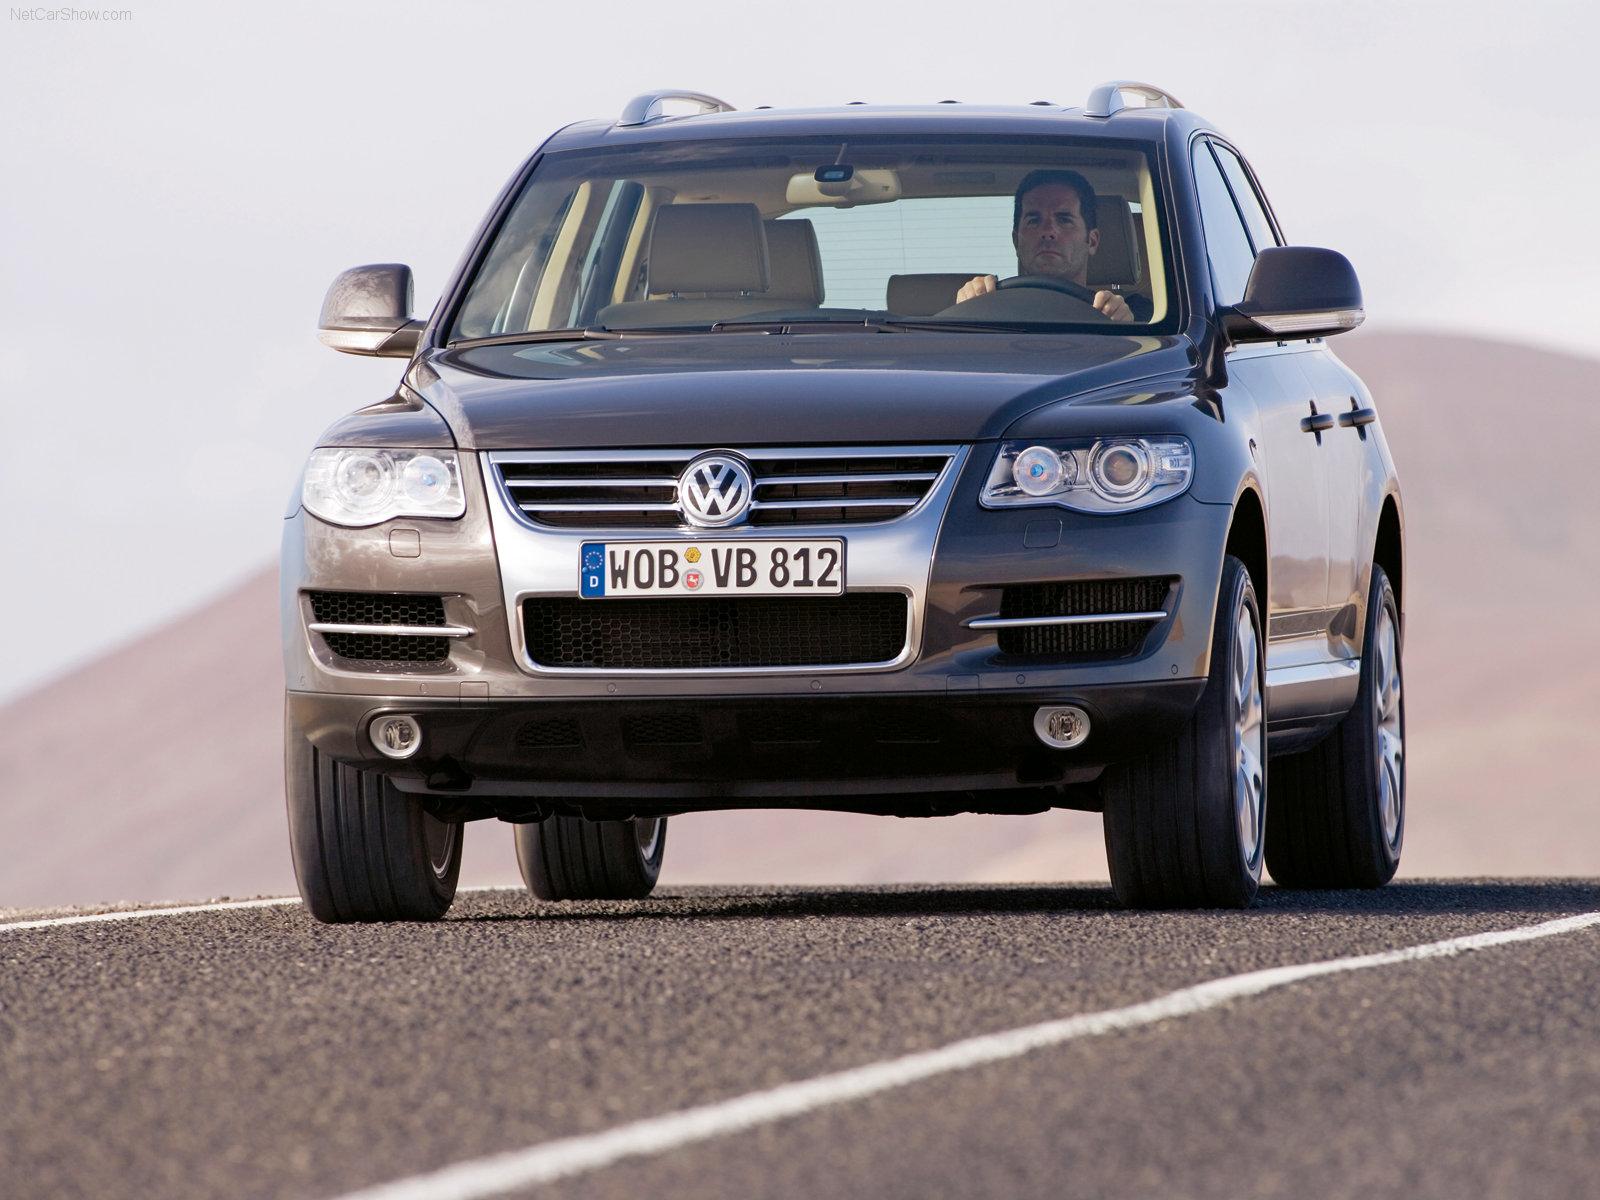 http://w04.ru/foto/Volkswagen-Touareg_2007_1600x1200_wallpaper_0f.jpg